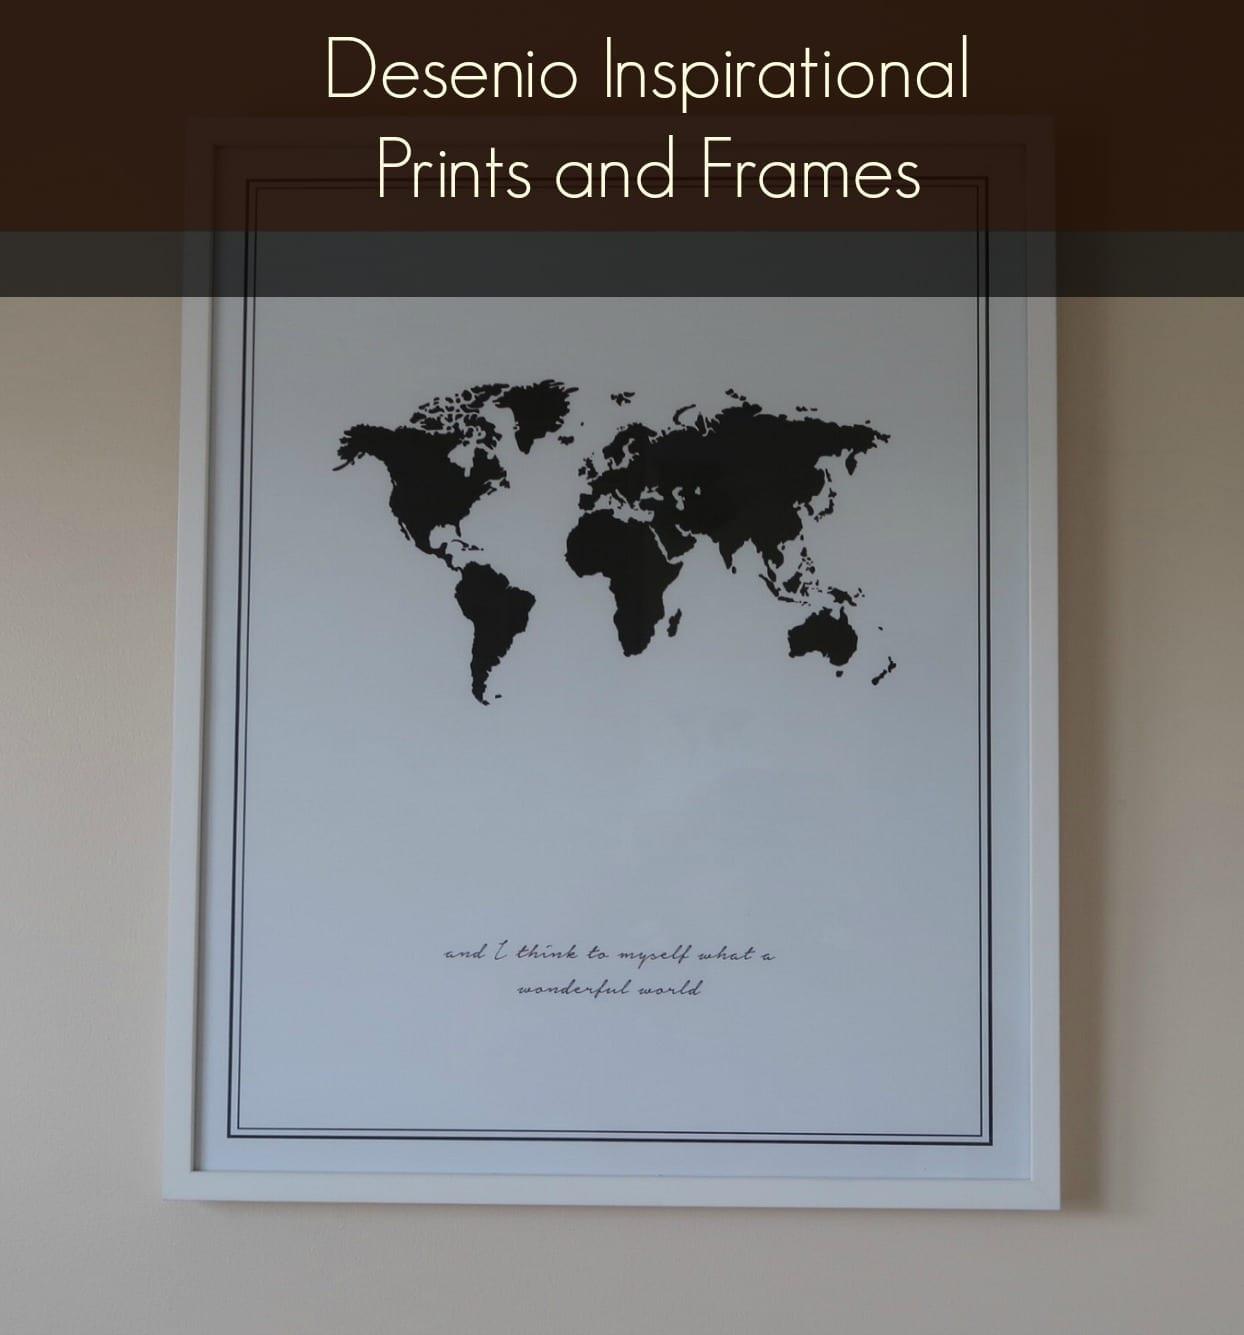 desensio-prints-and-frames